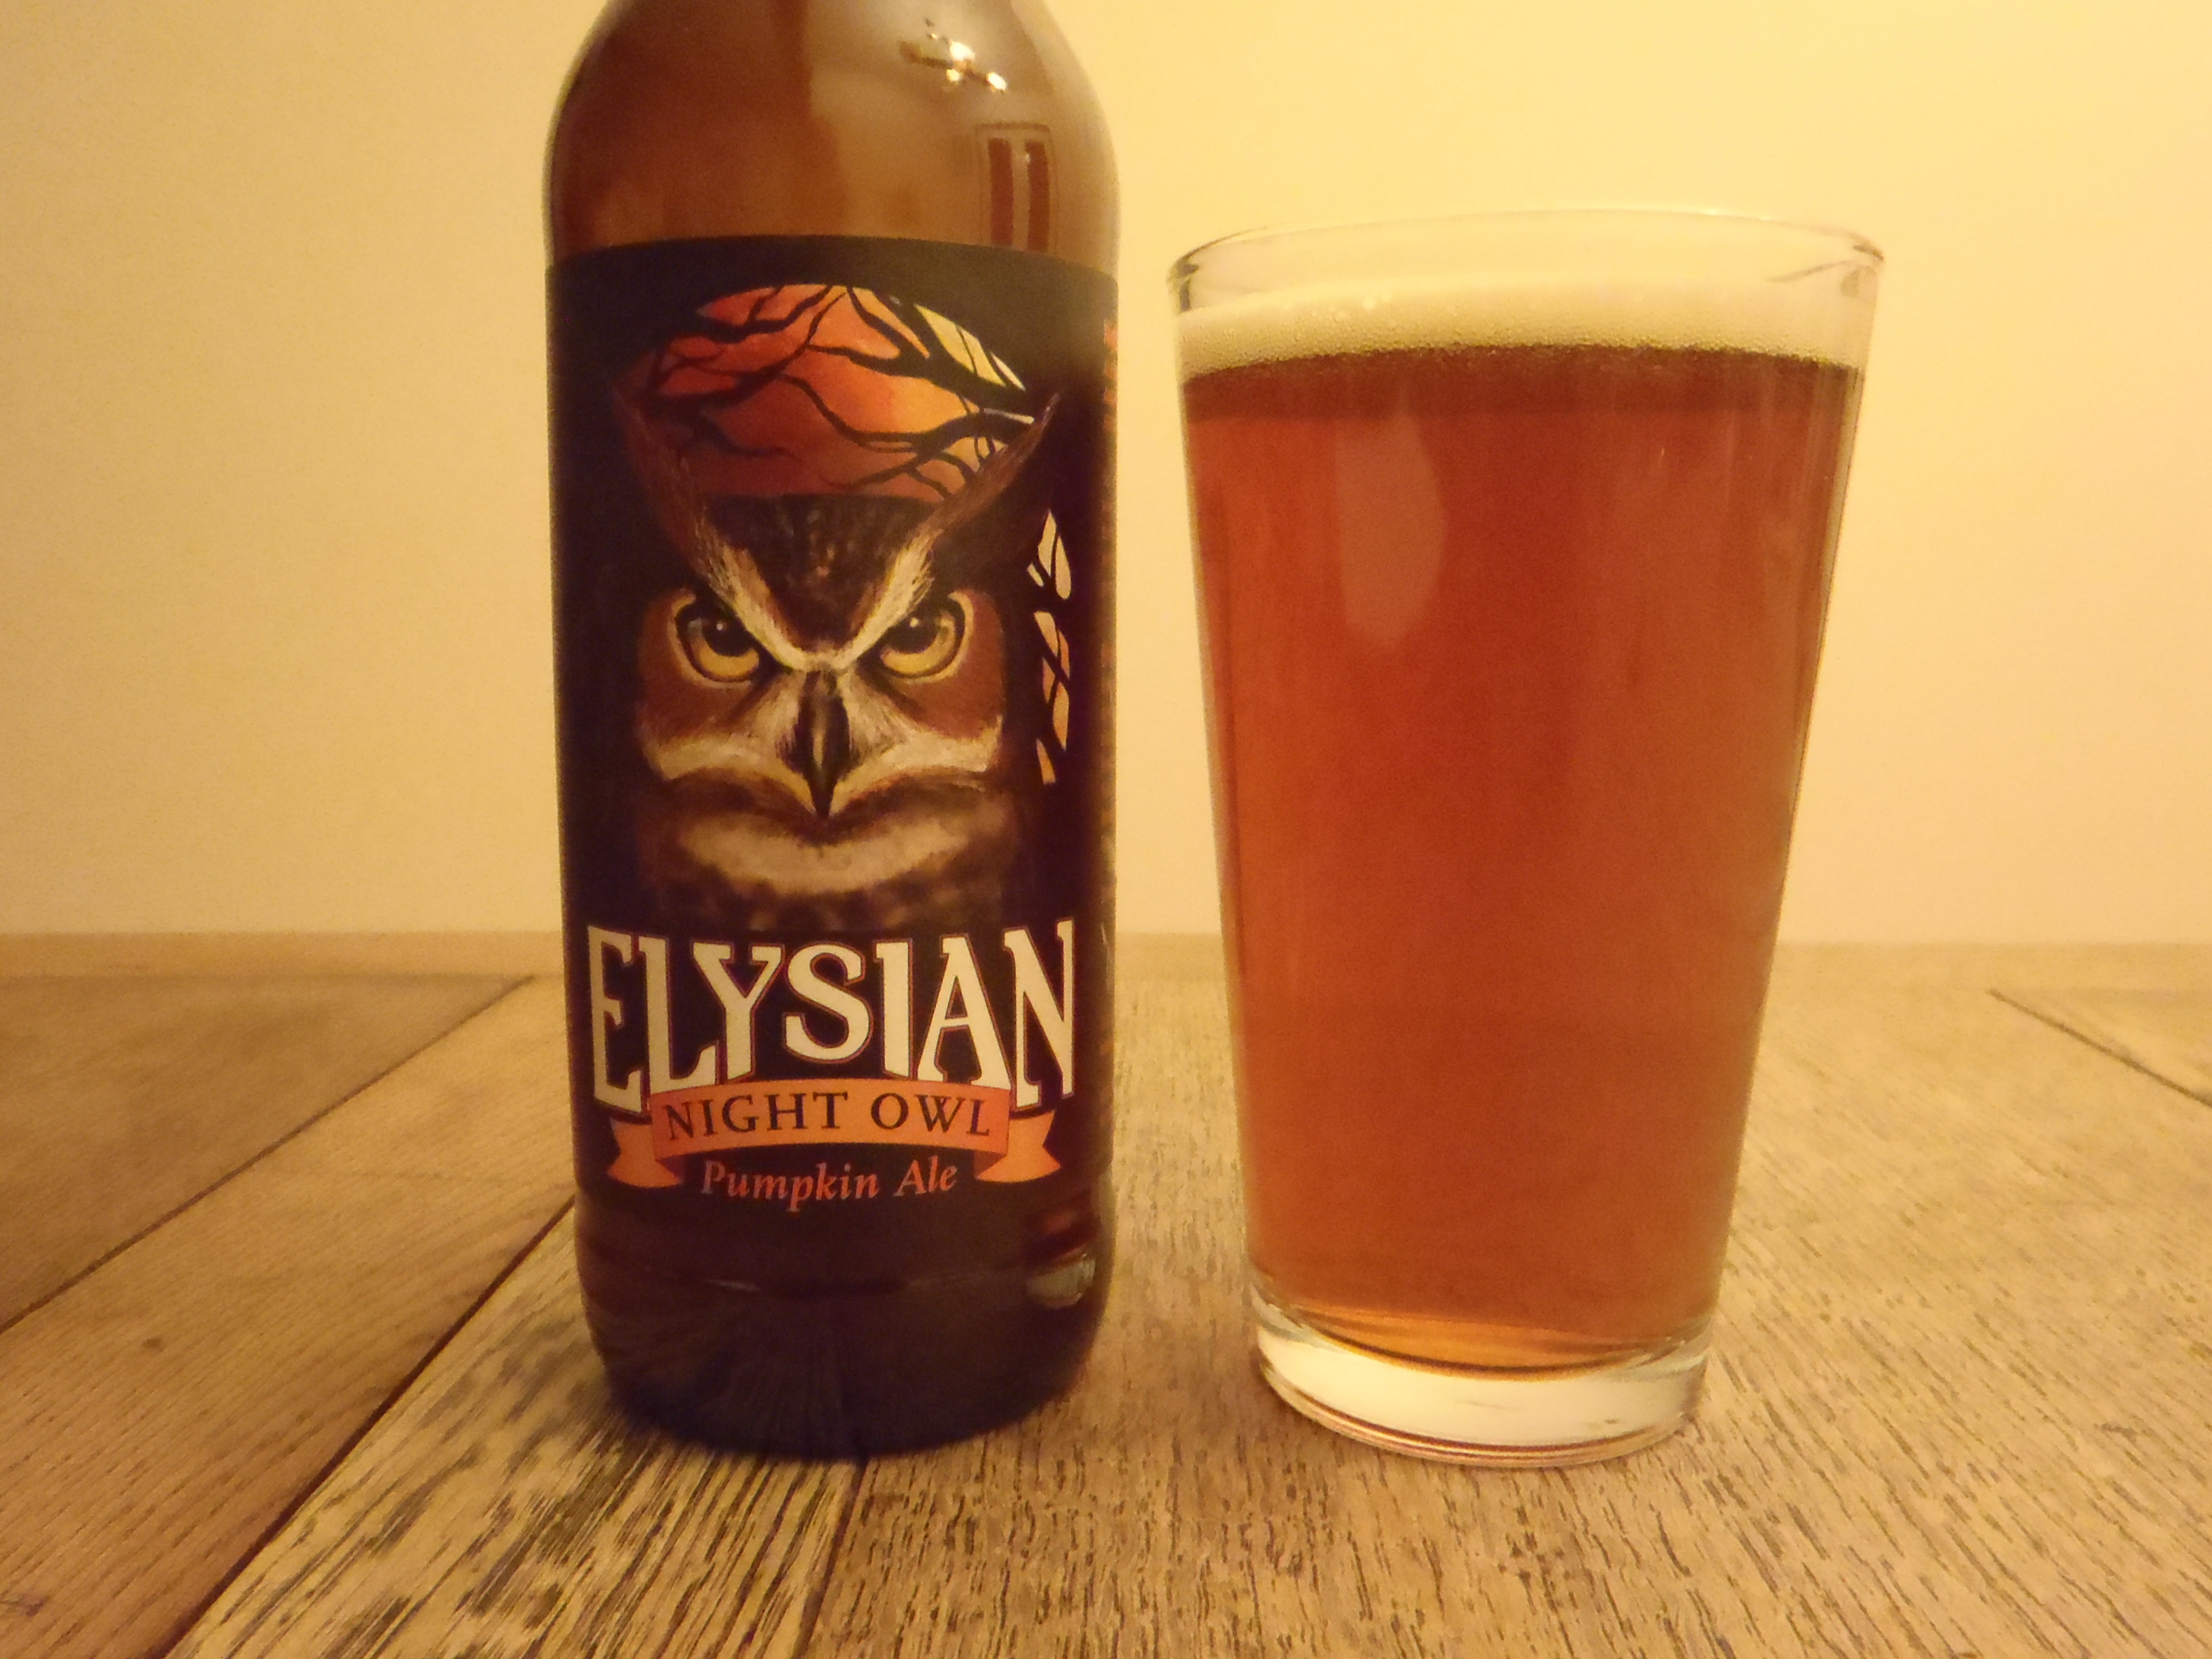 Elysian Night Owl – Head to Head – Review by Bill Fishburn